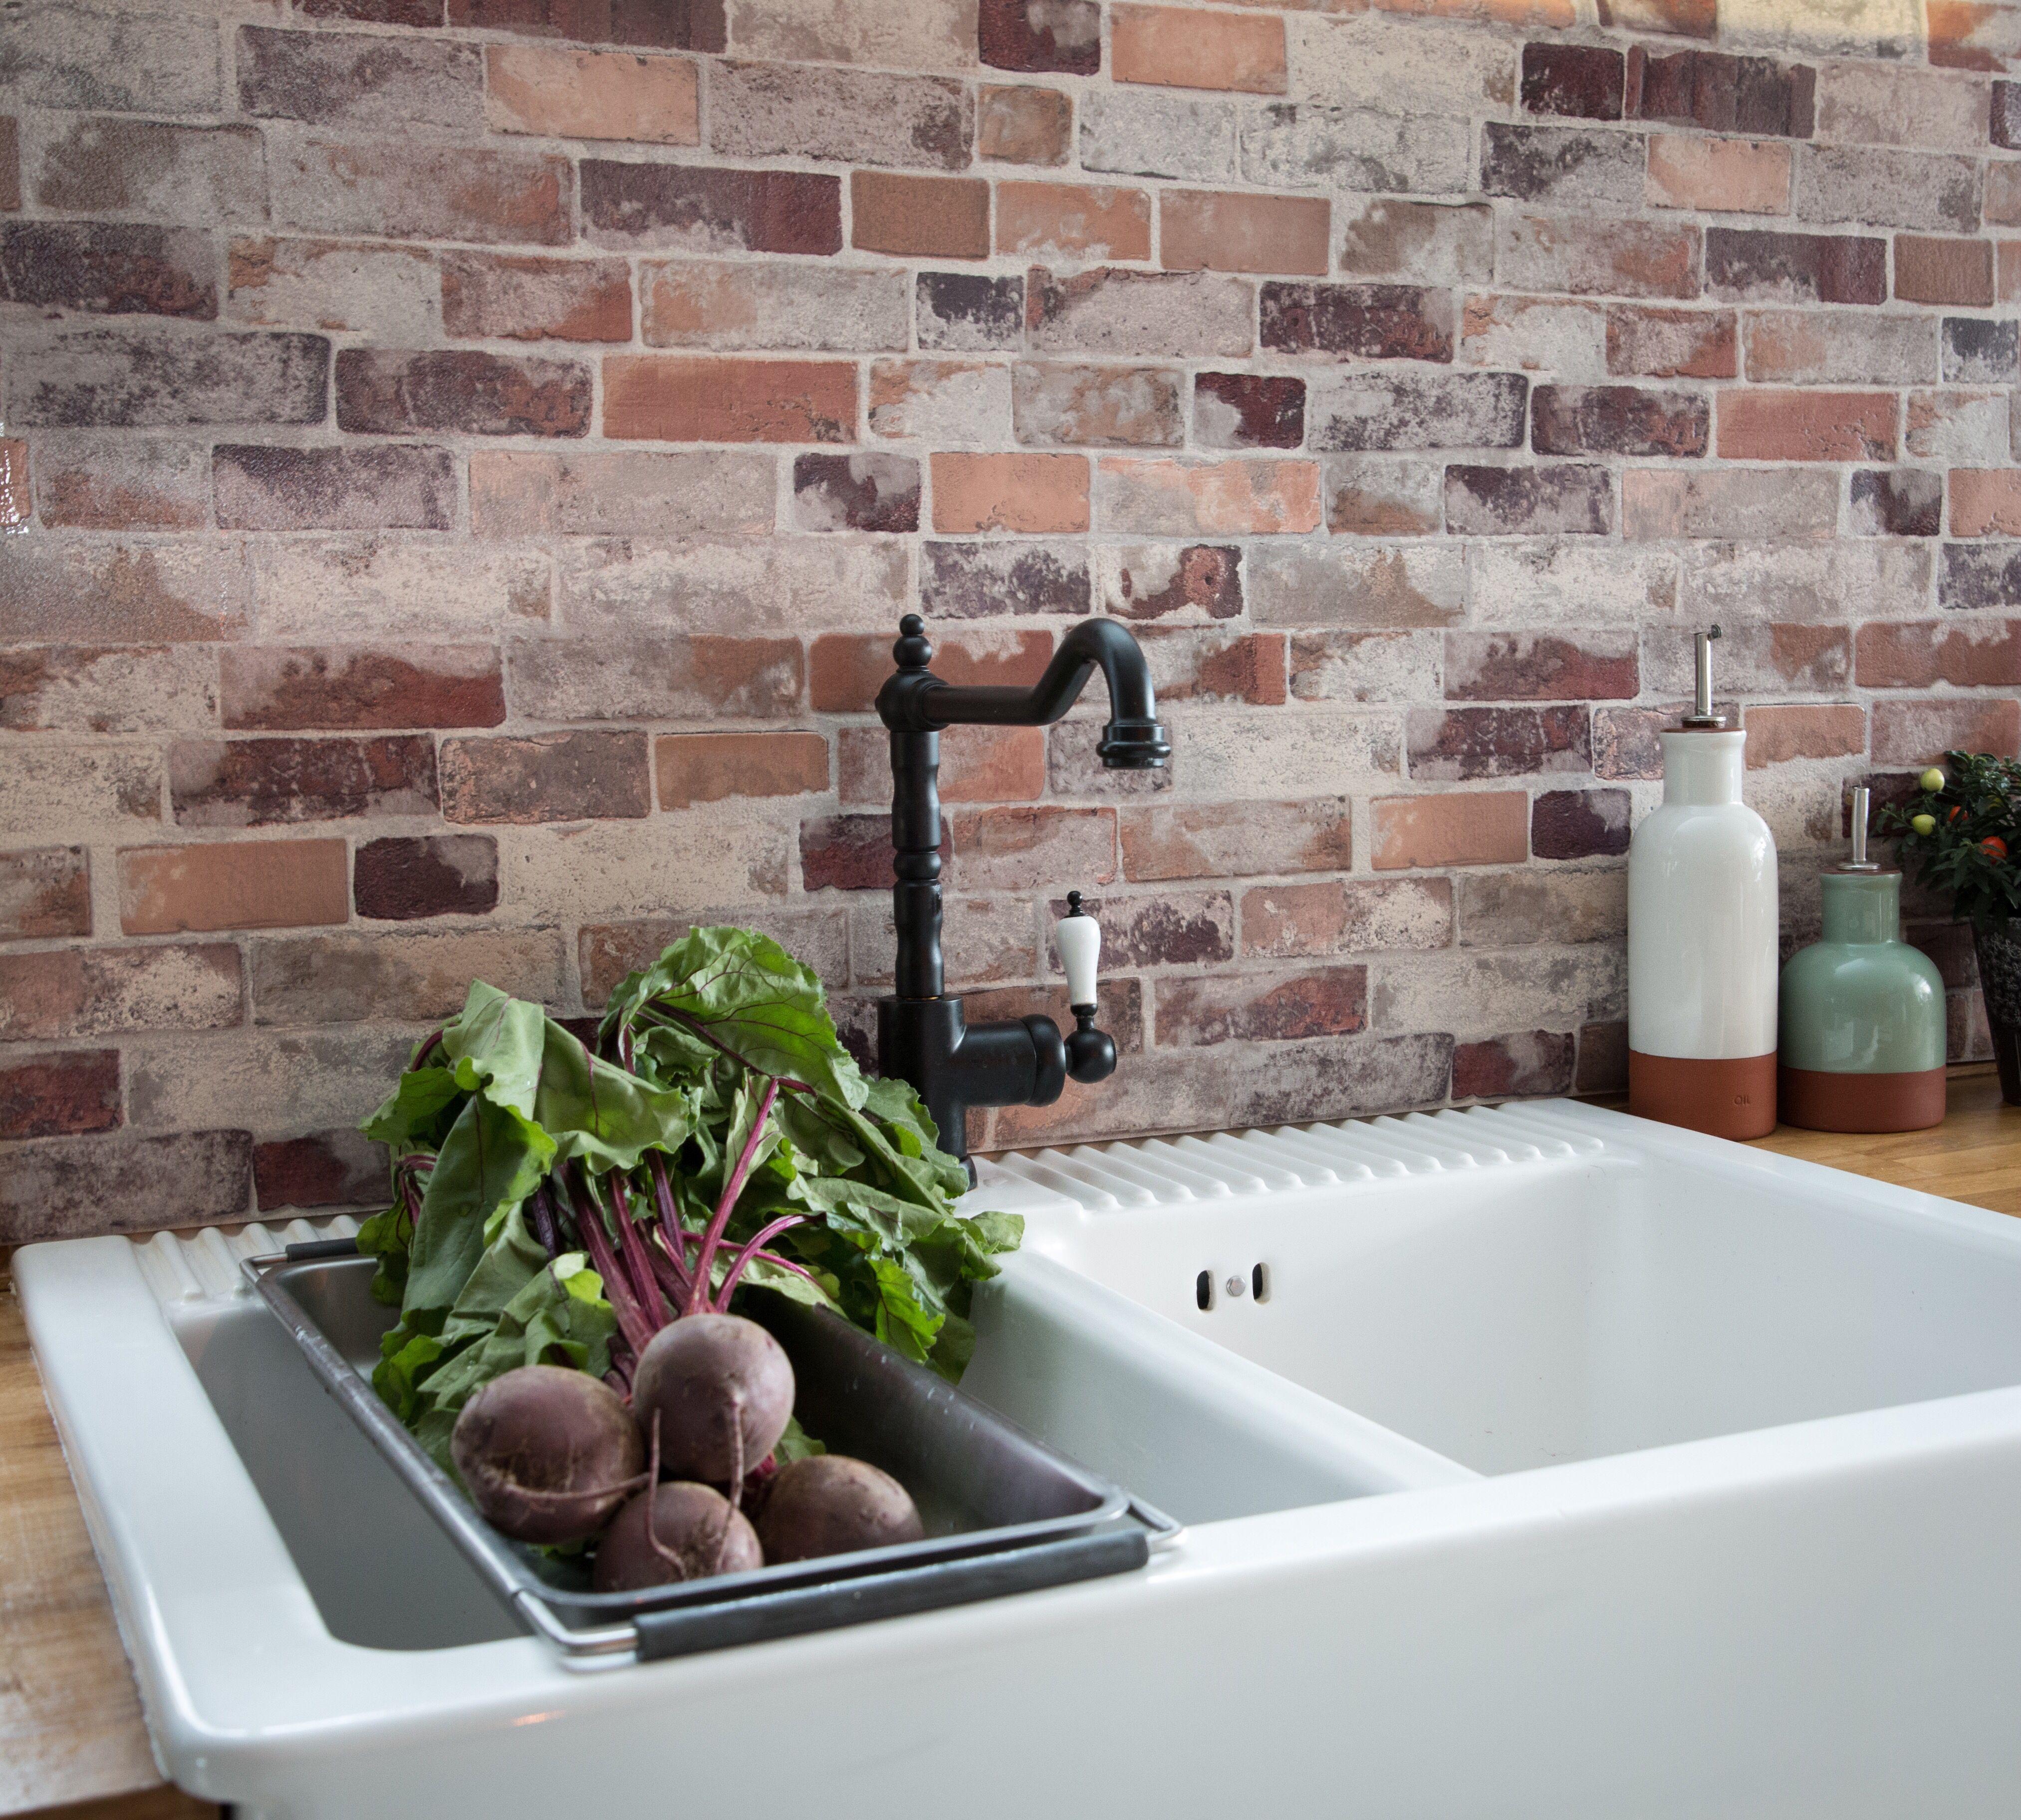 67 5cm X 4m D C Wall Vintage Brick Tisa 3d Splashback Tile